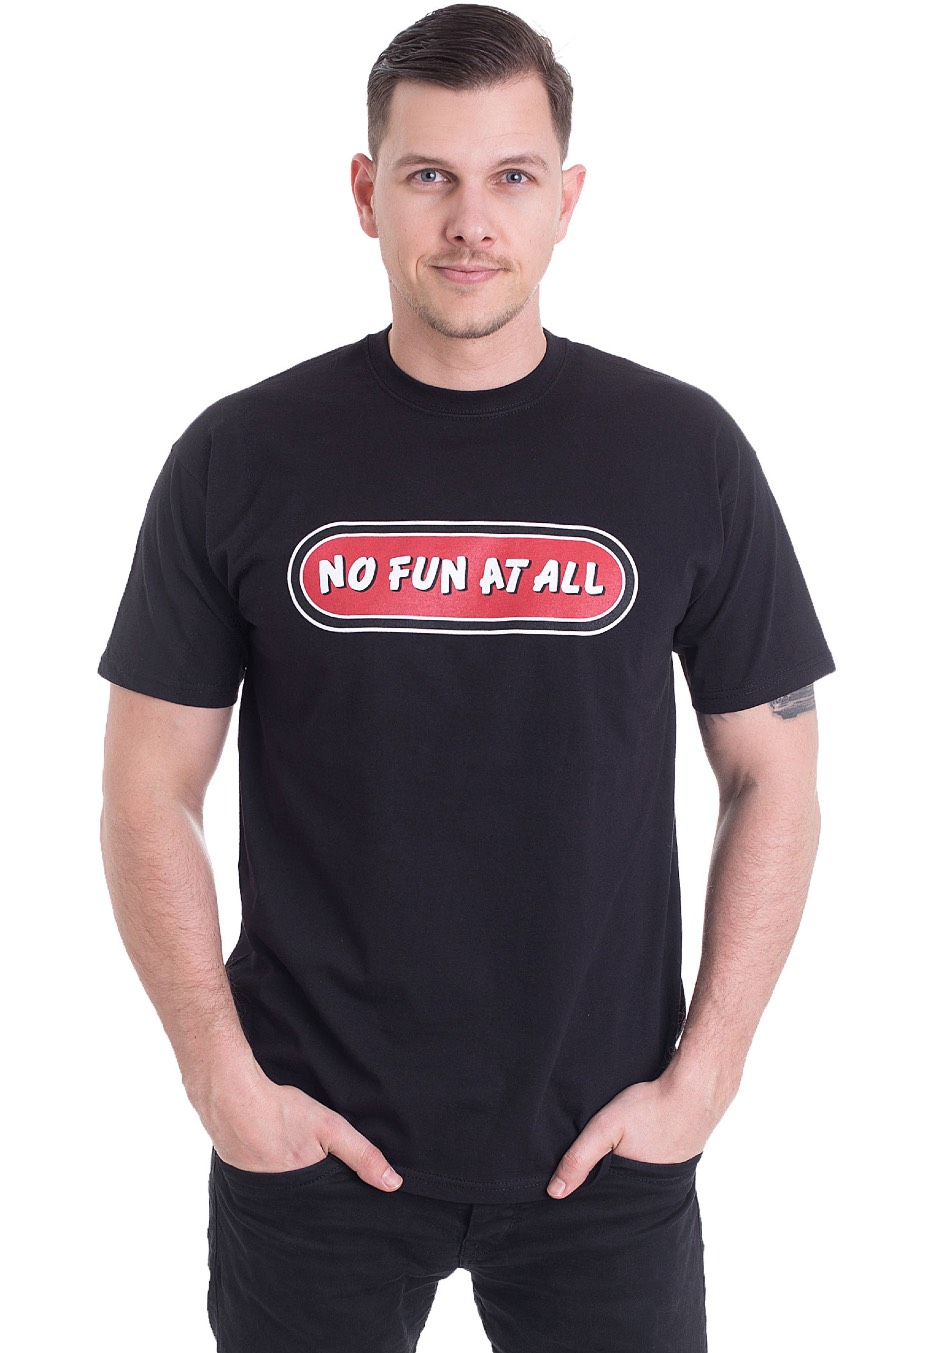 790eab9b4ef No Fun At All - Classic Logo - T-Shirt - Offizieller Pop Punk Merchandise  Shop - Impericon.com DE